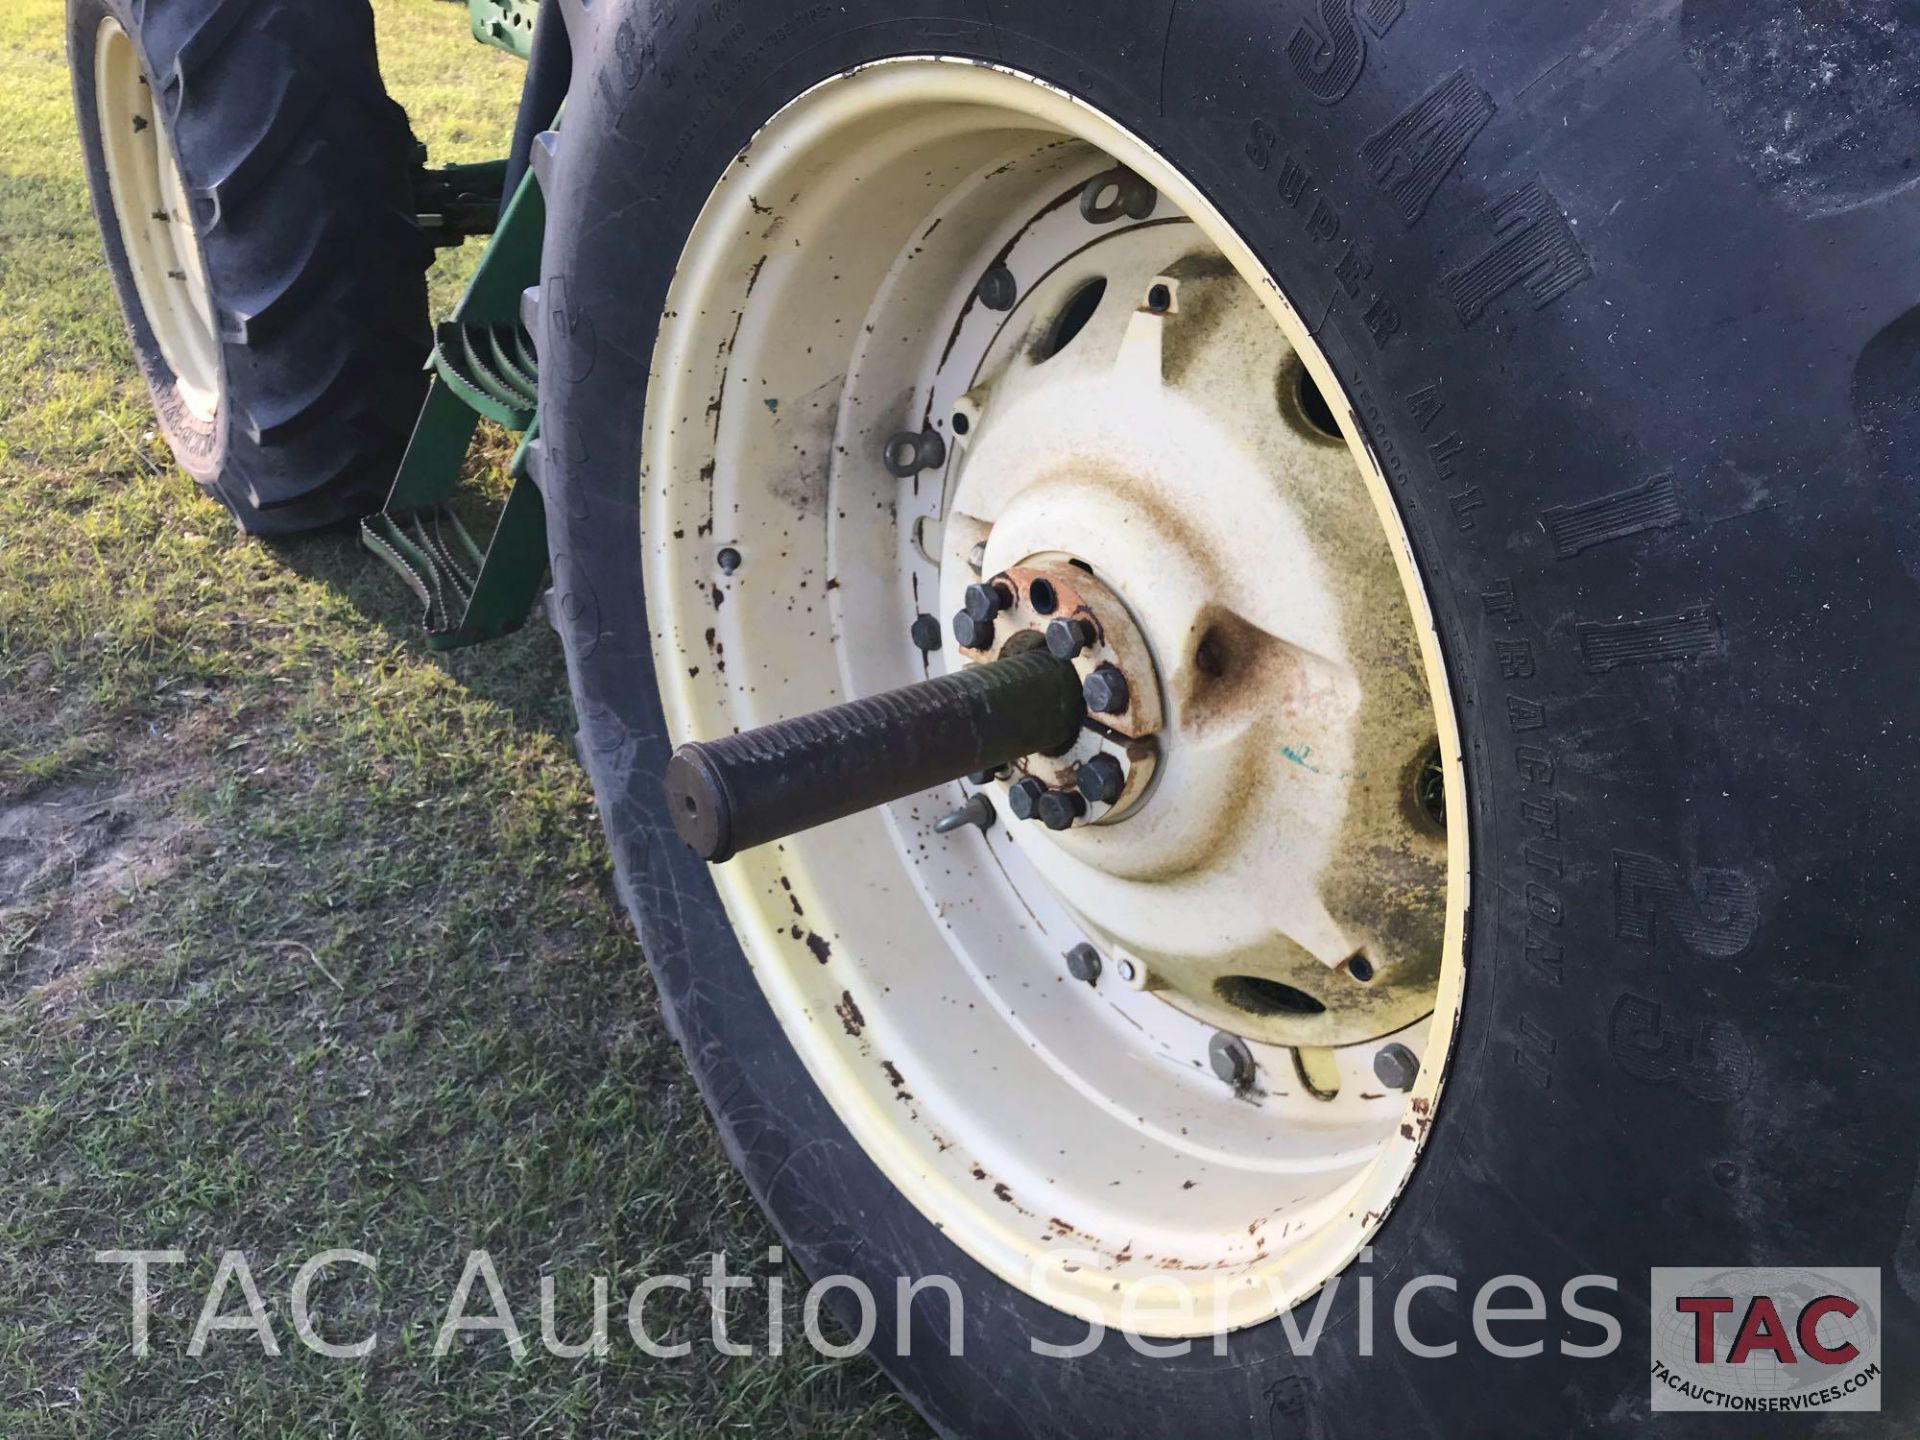 John Deere 7410 Farm Tractor - Image 17 of 24